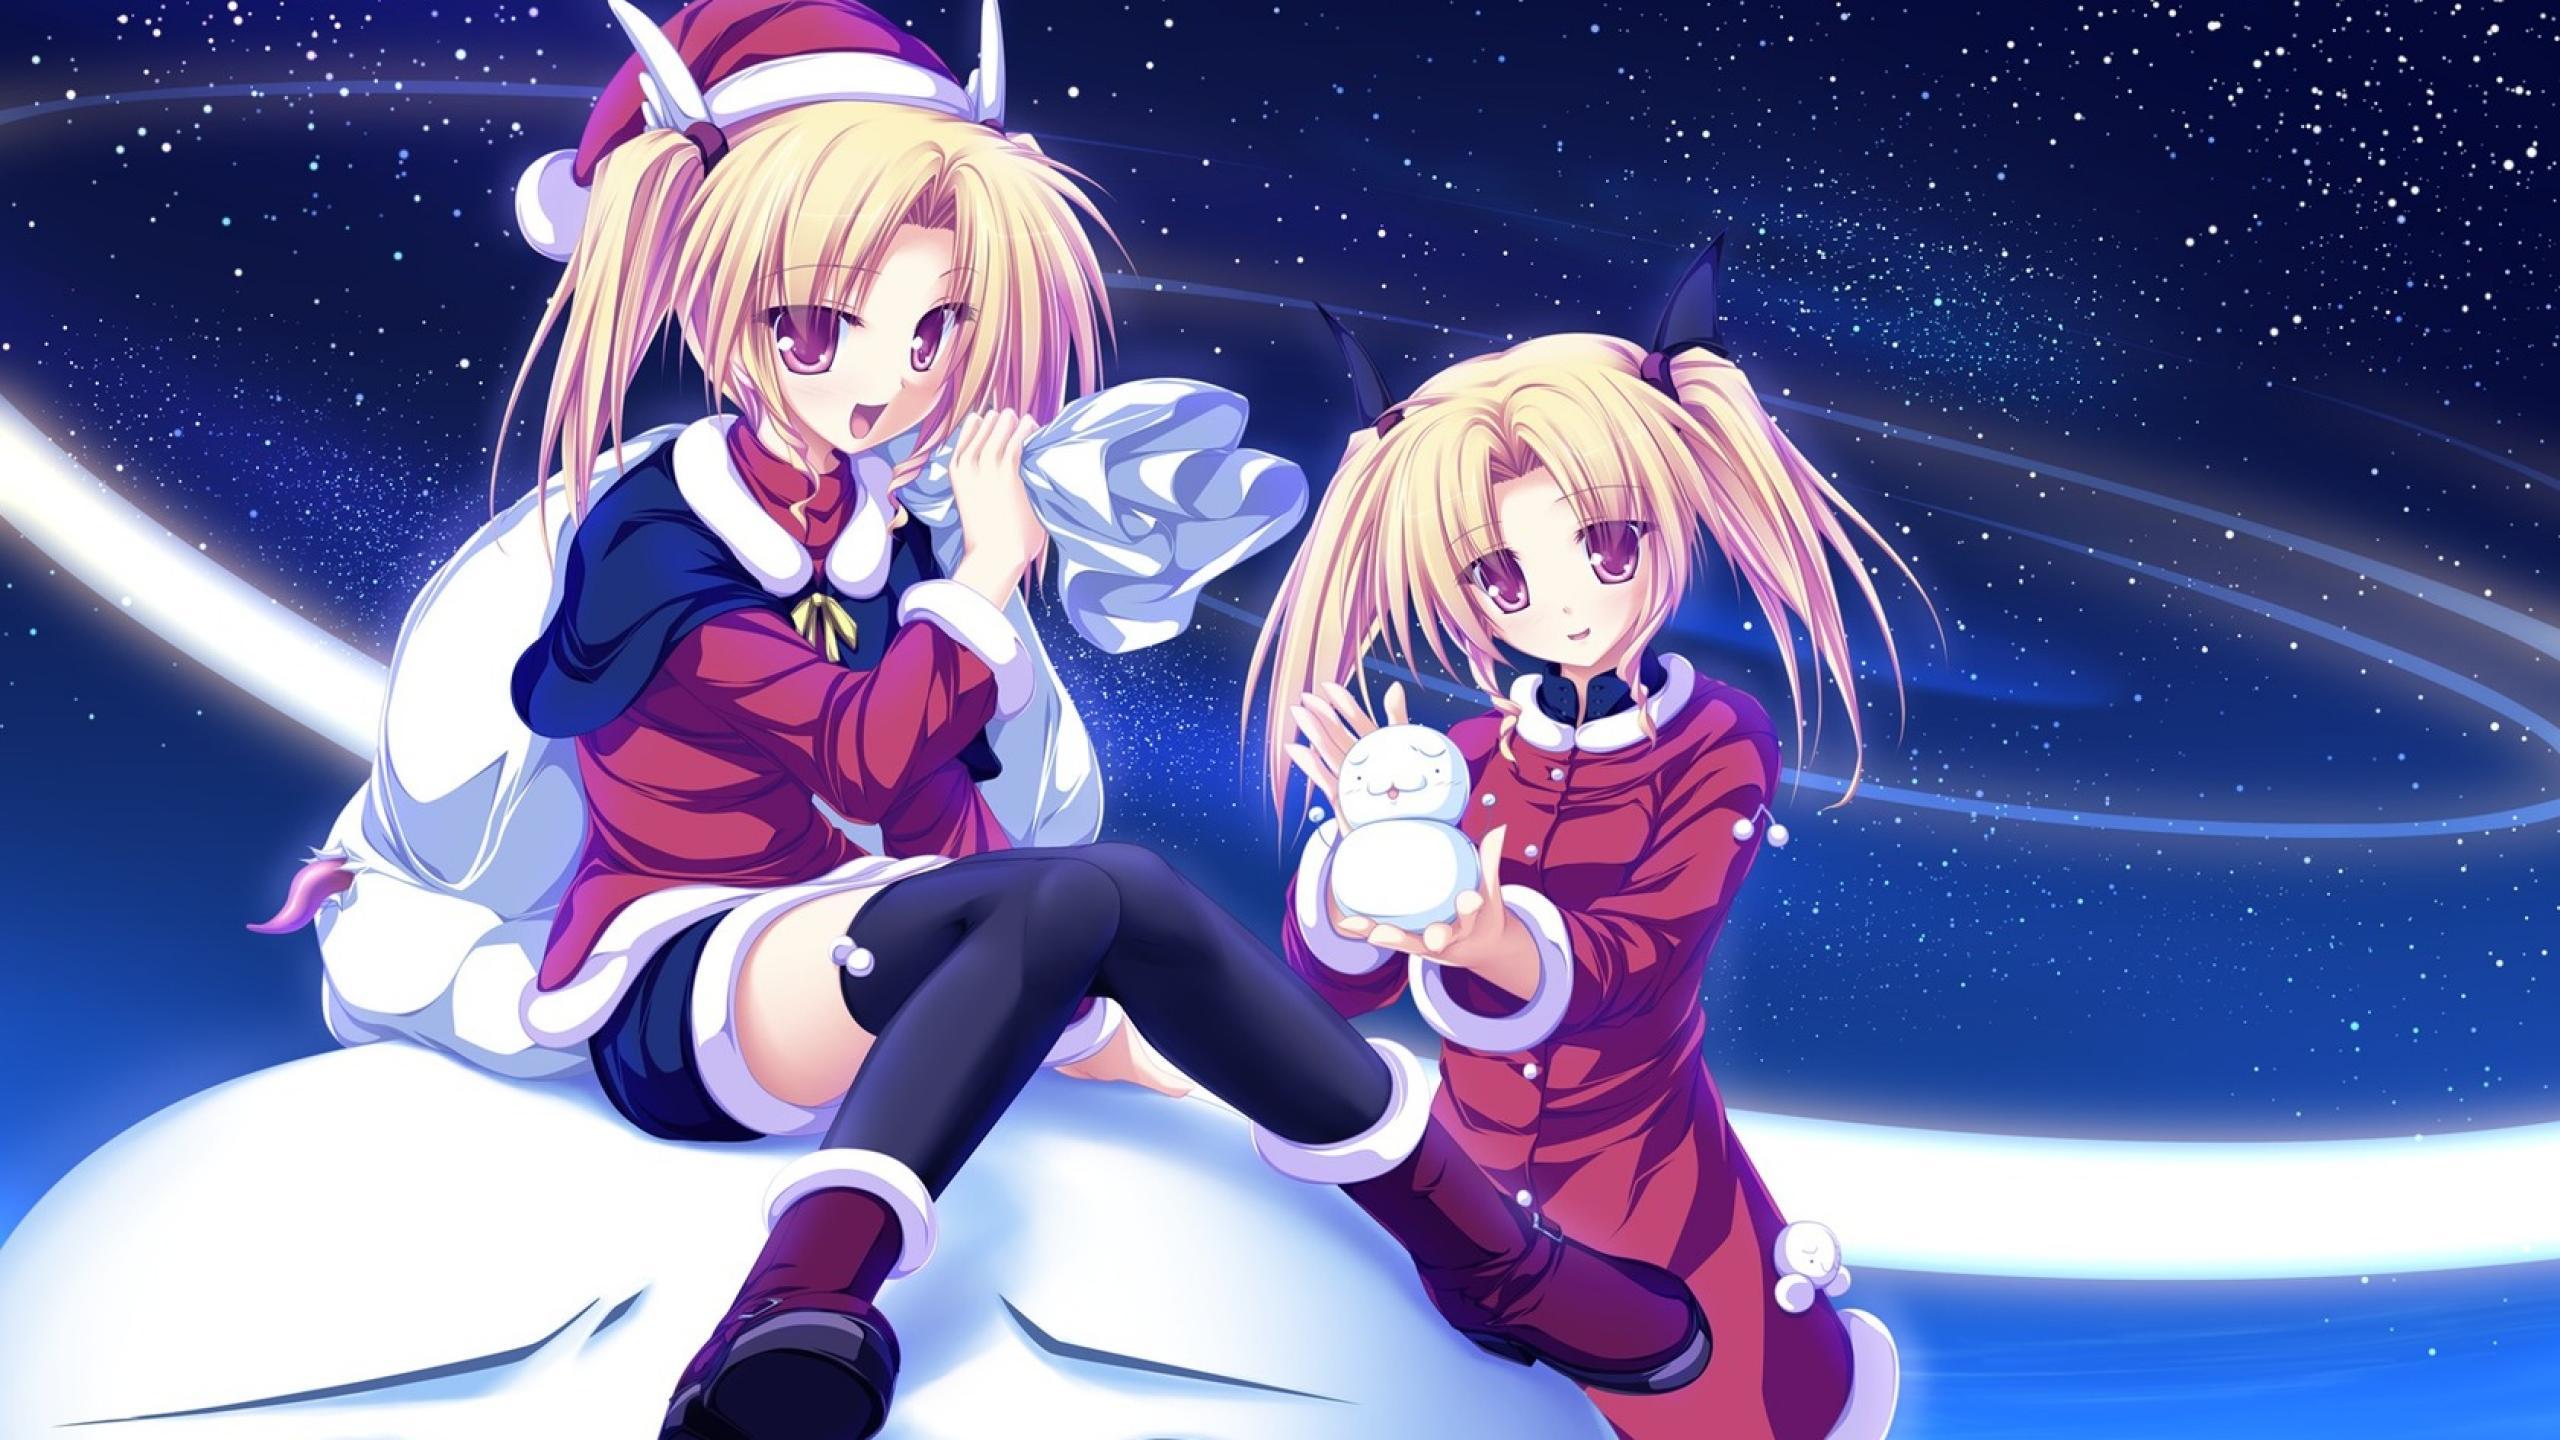 Magnificent Christmas anime